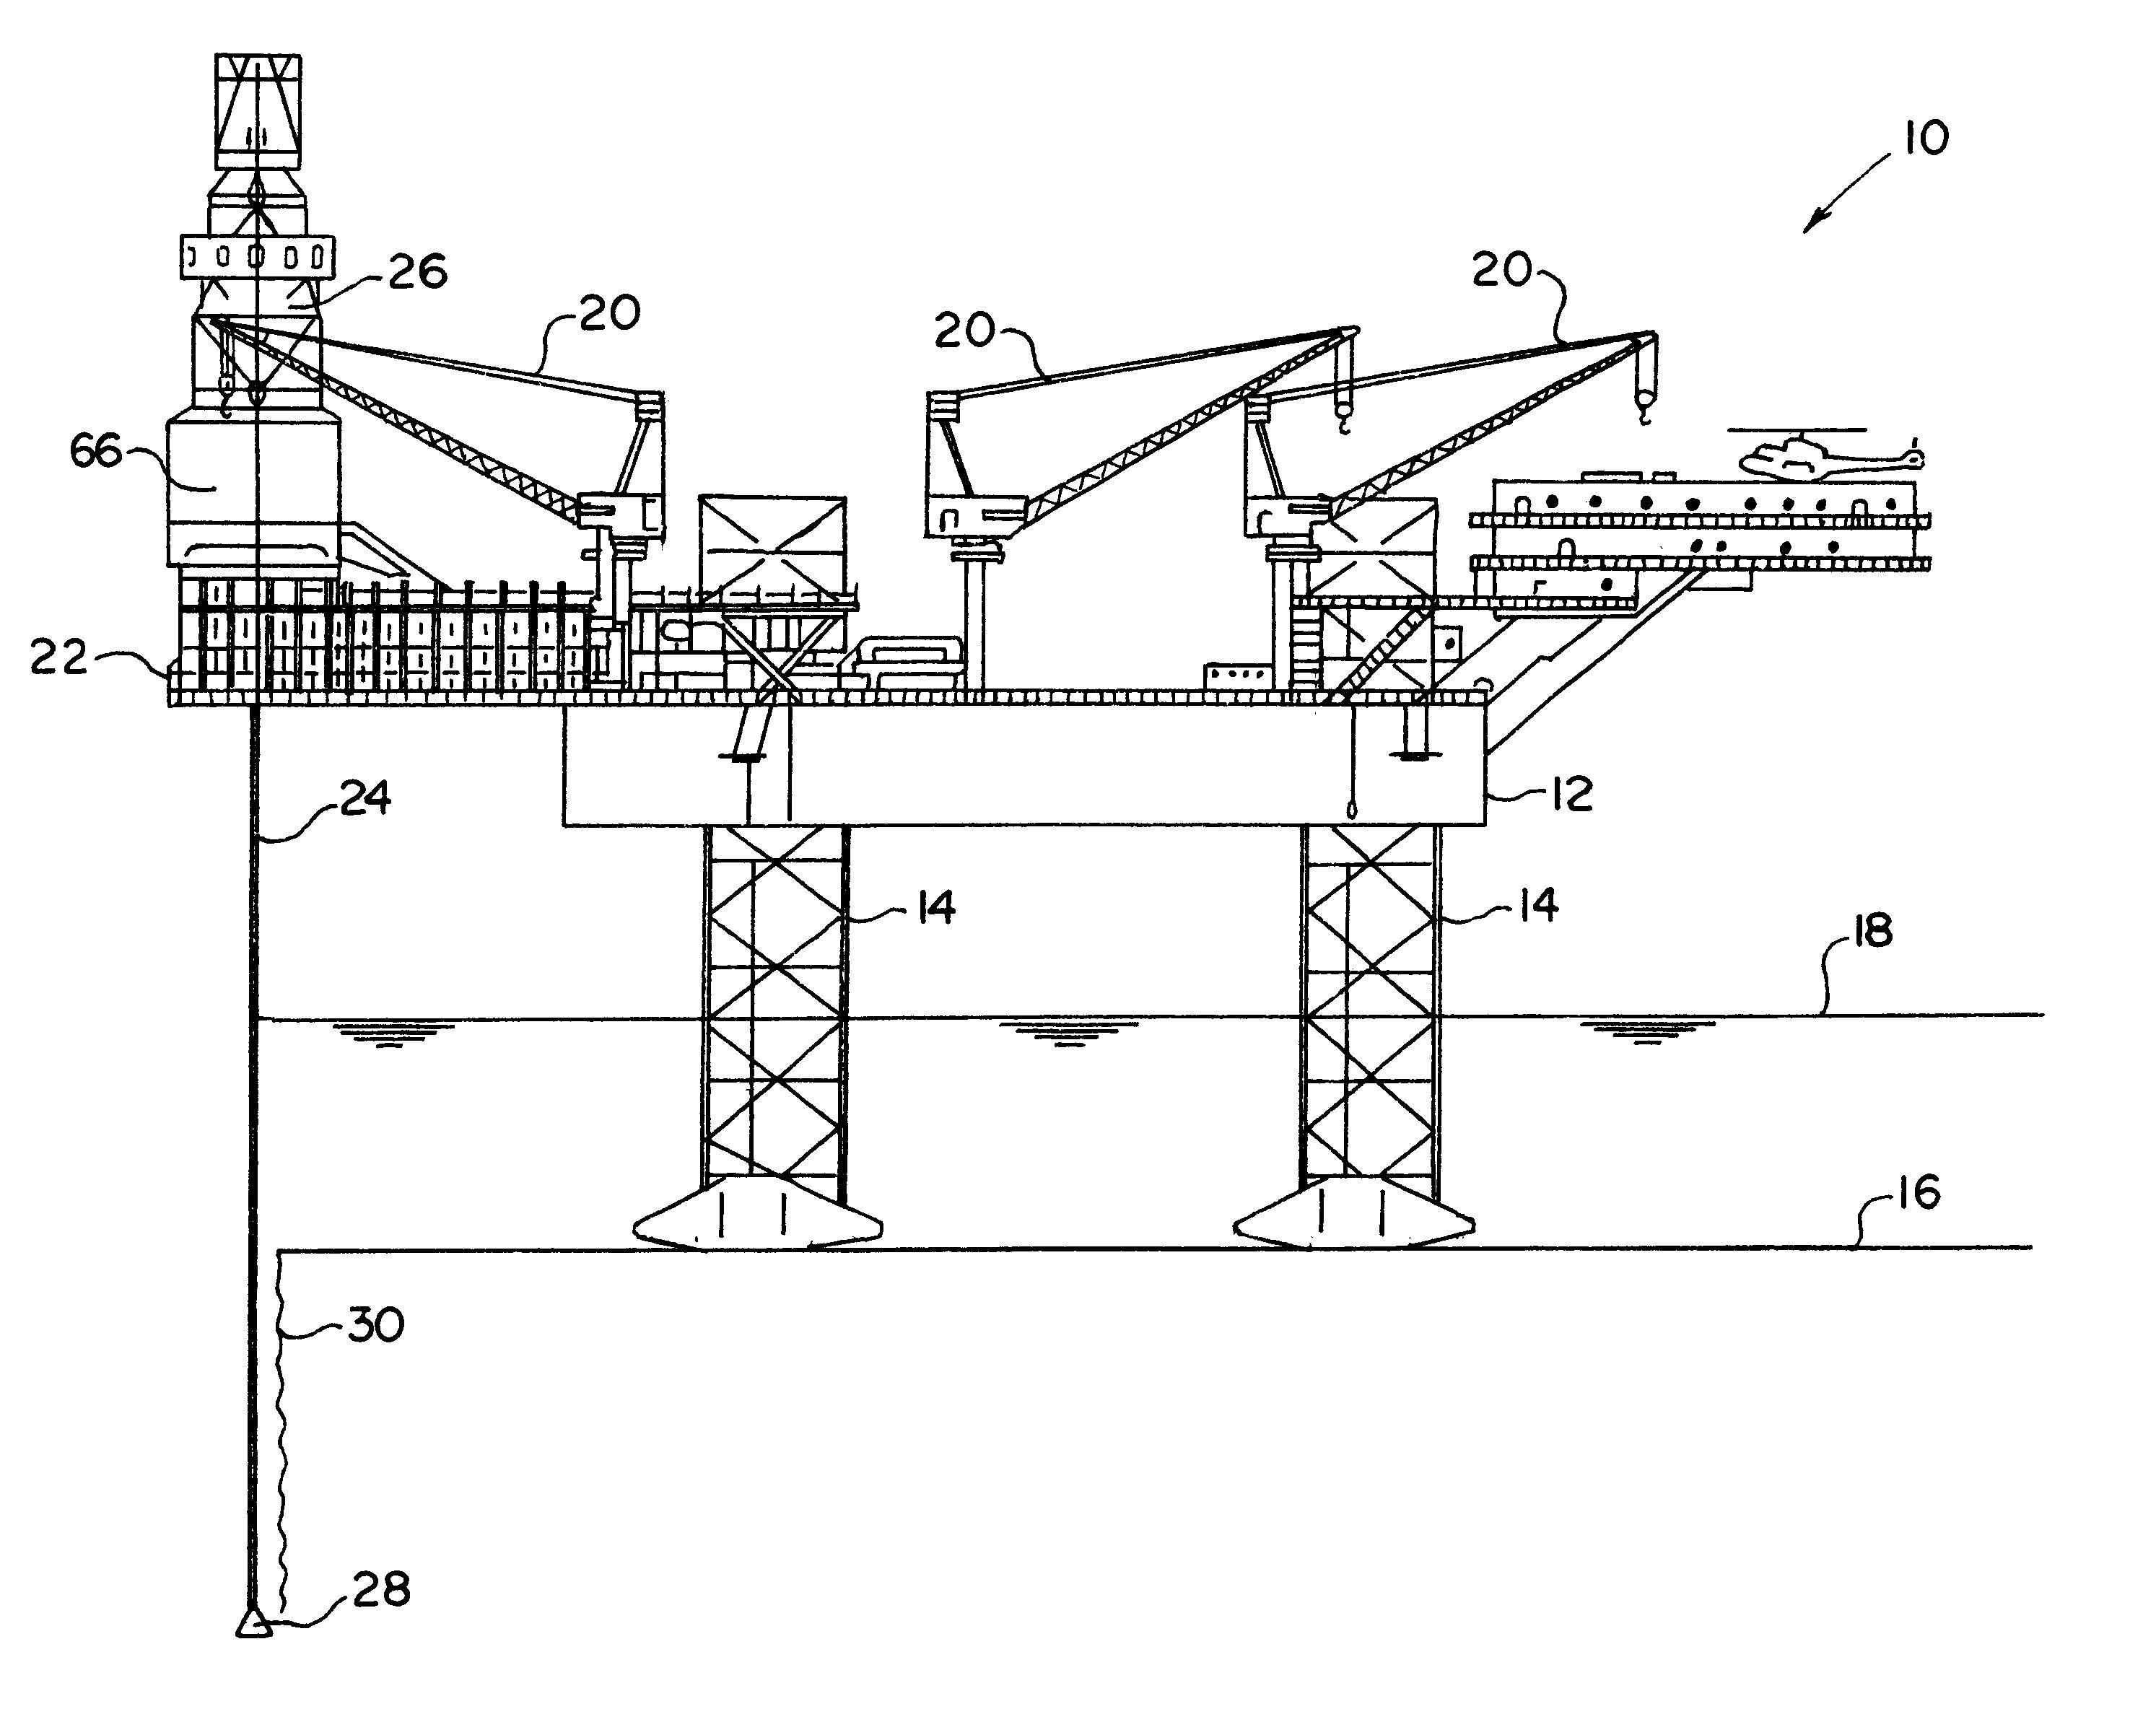 oil rig blueprint